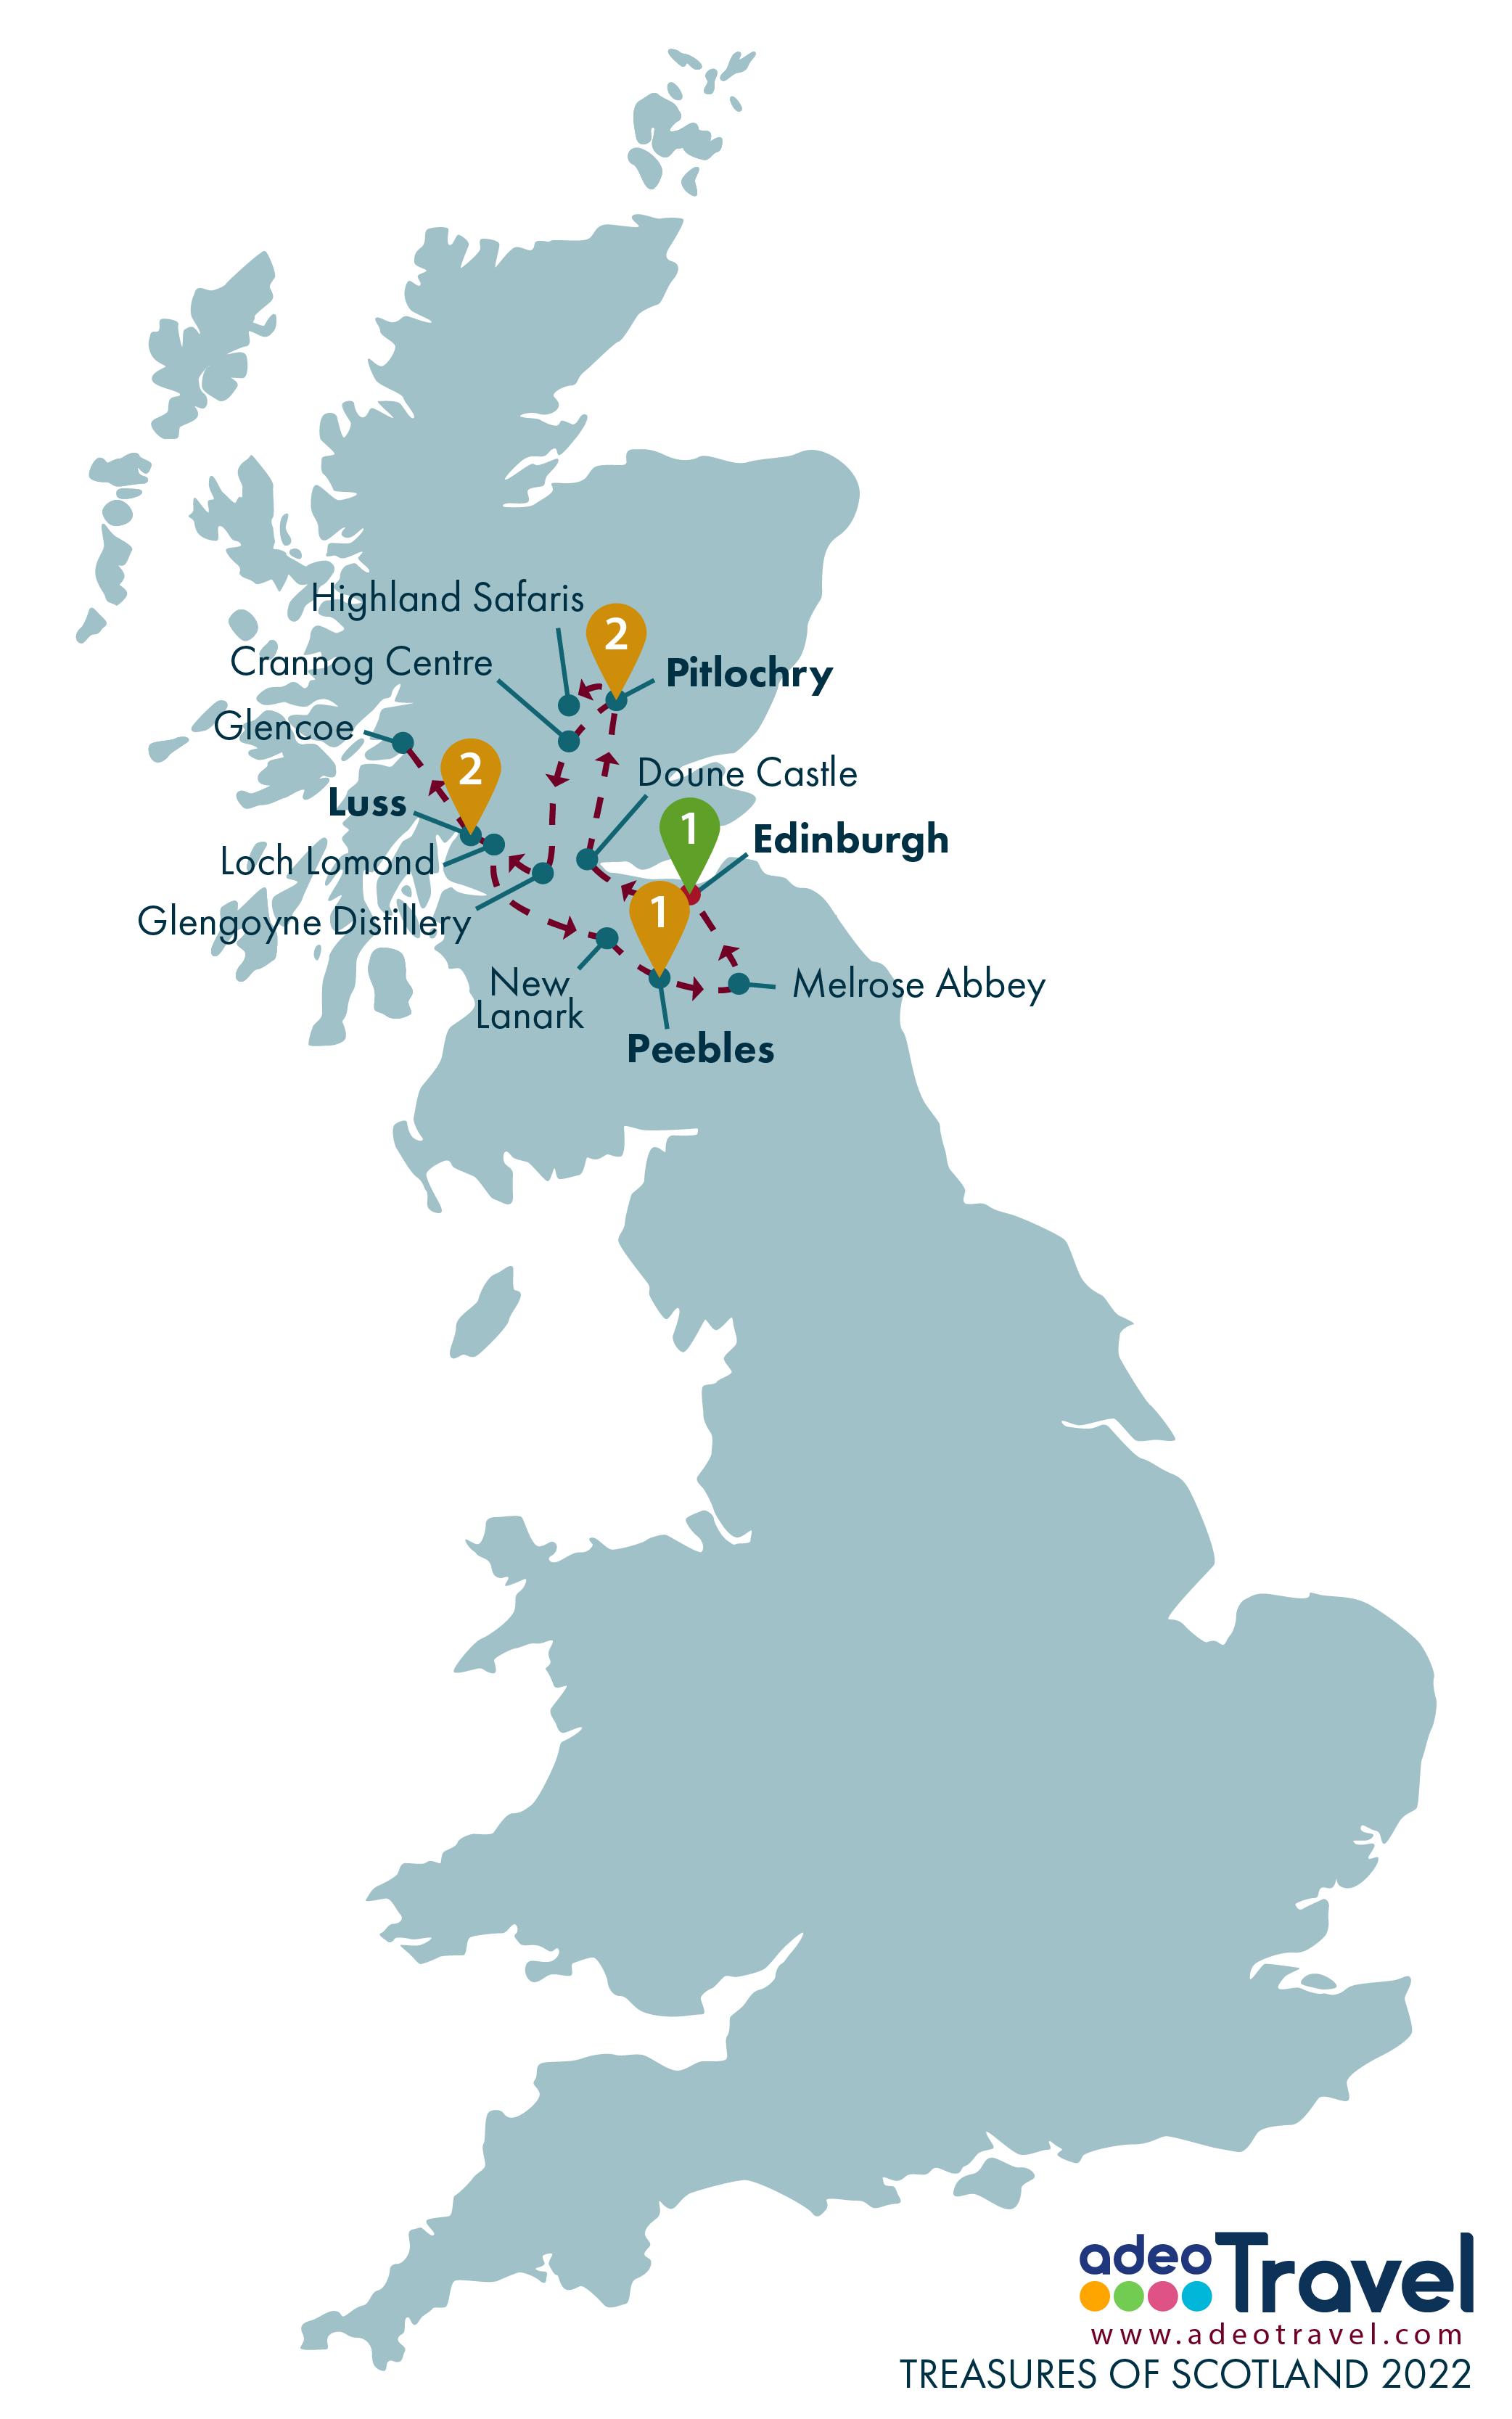 Map - Treasures of Scotland 2022